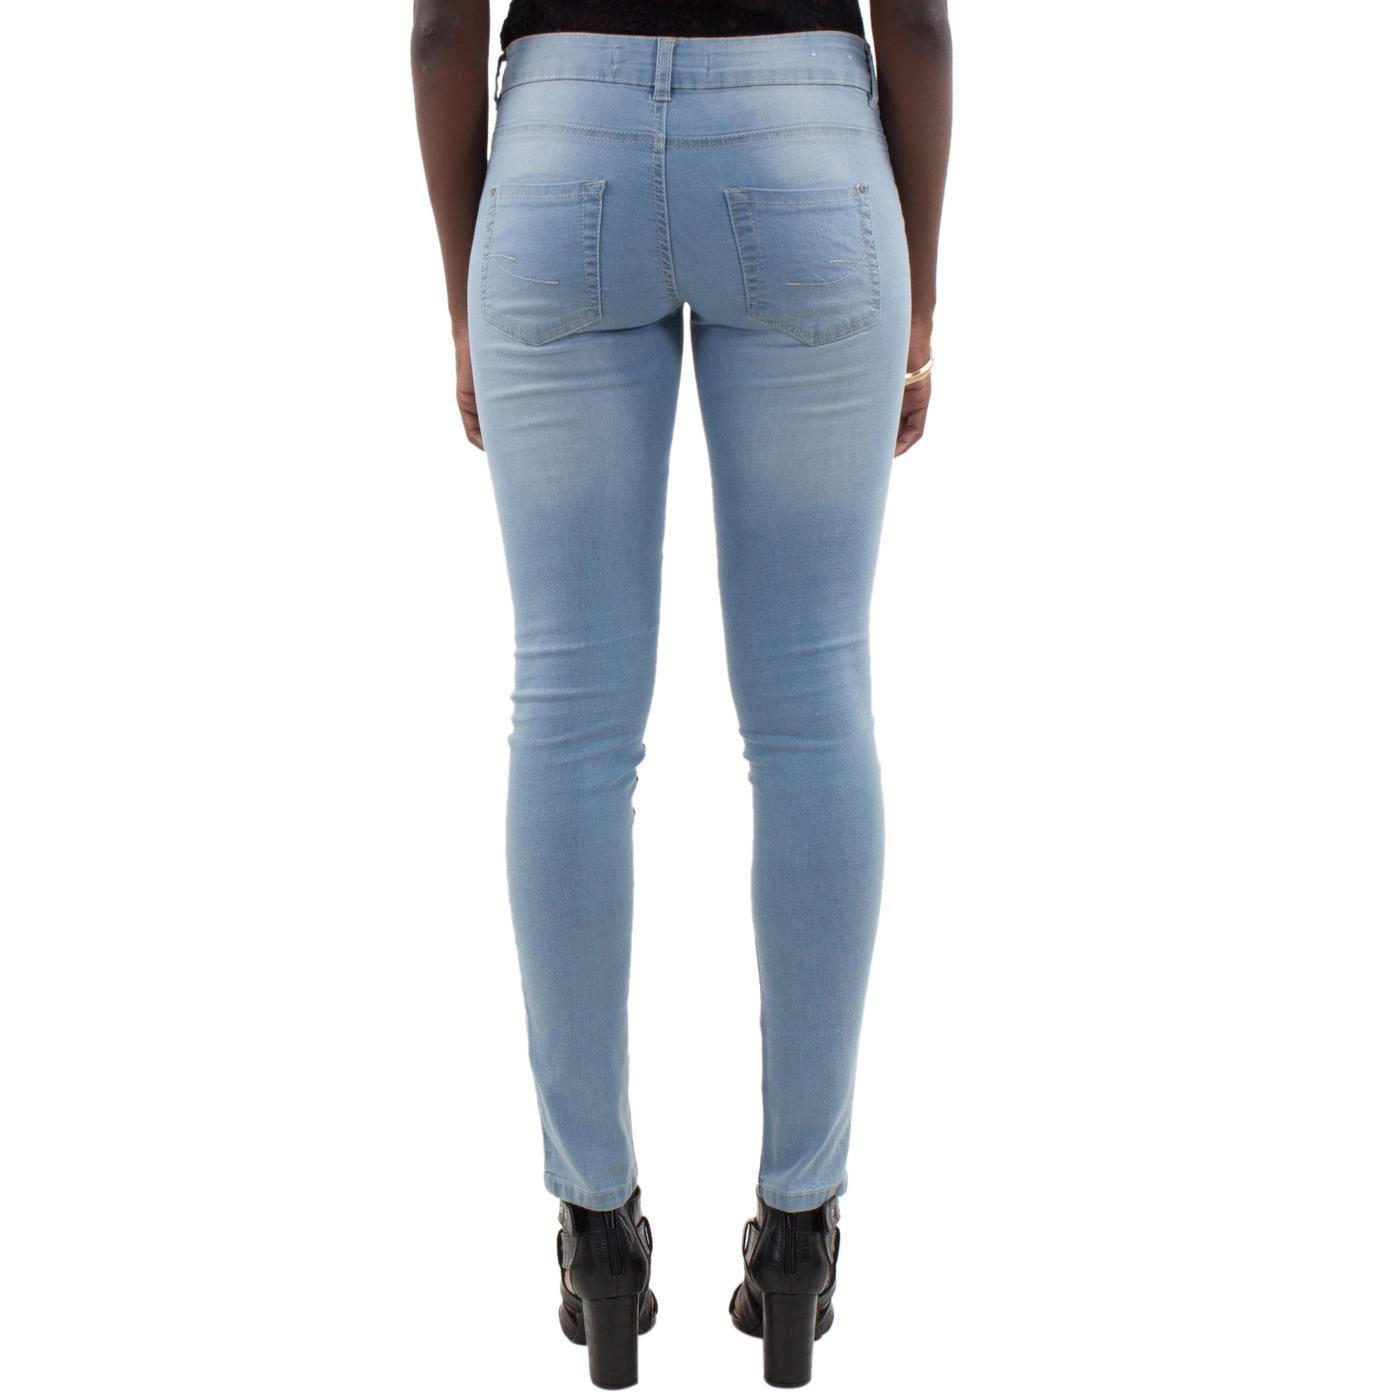 mim women 39 s casual jeans super skinny international new look ebay. Black Bedroom Furniture Sets. Home Design Ideas